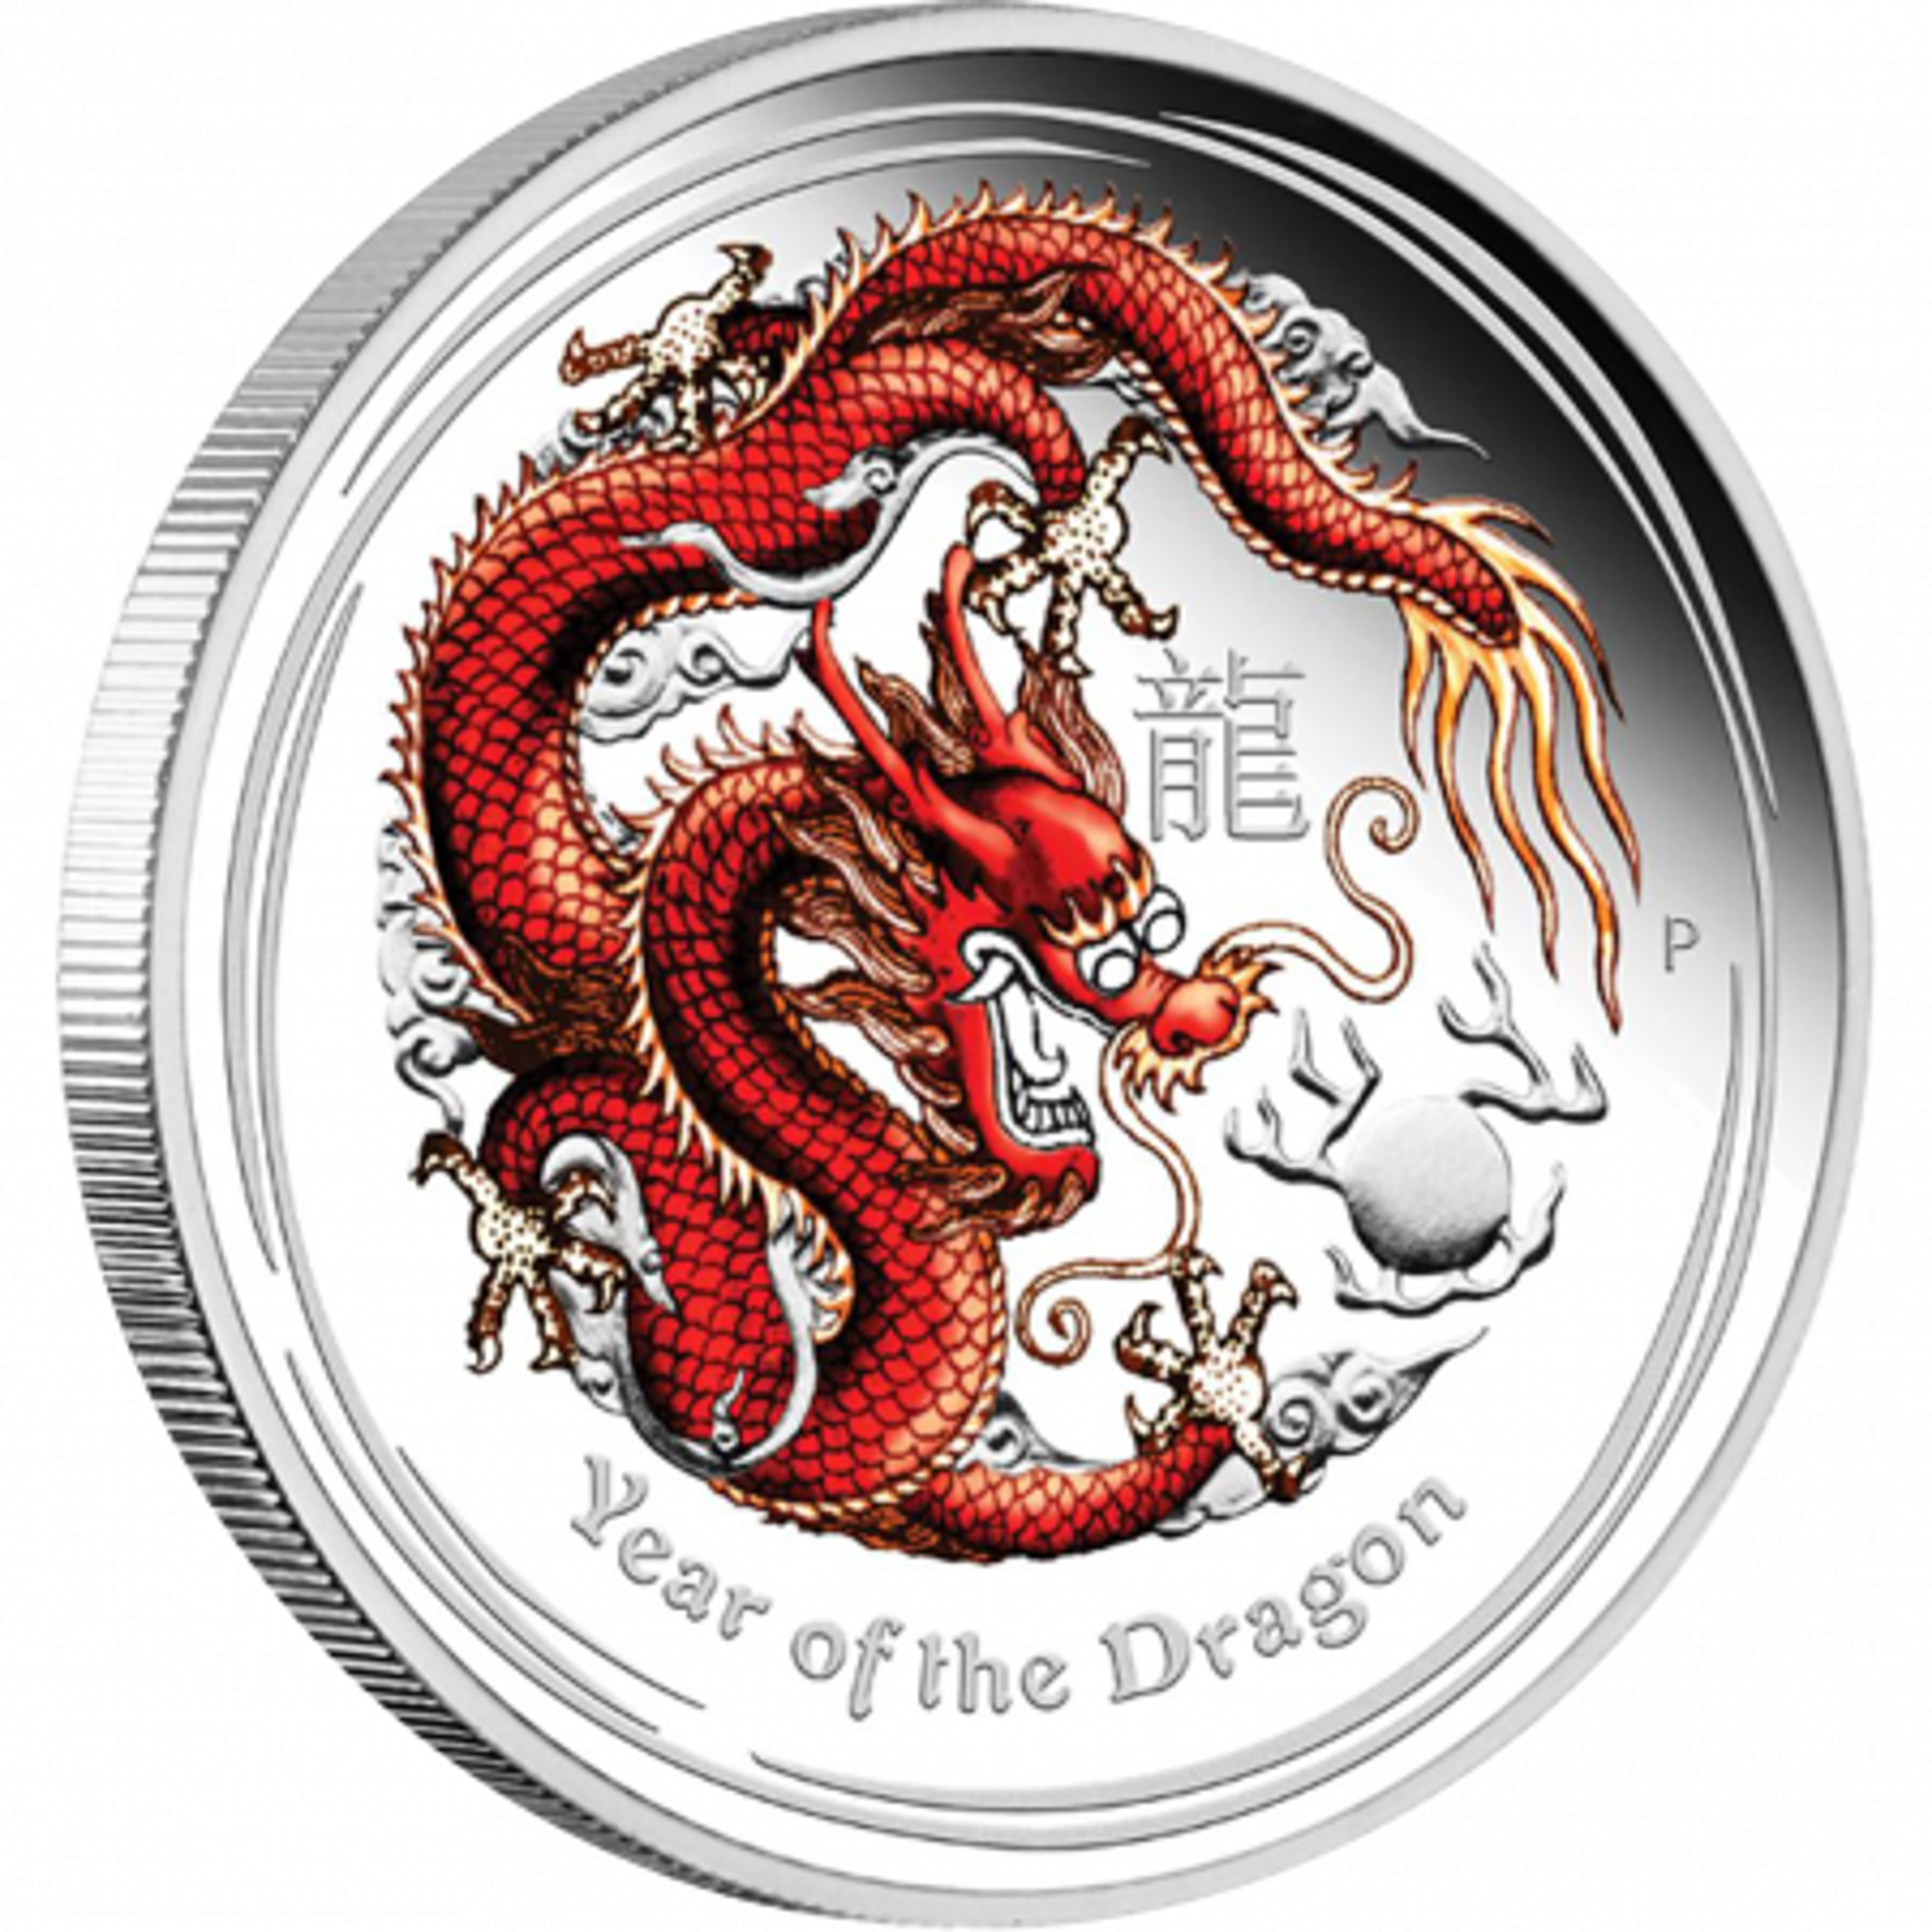 Lunar zilver kilo munt in kleur